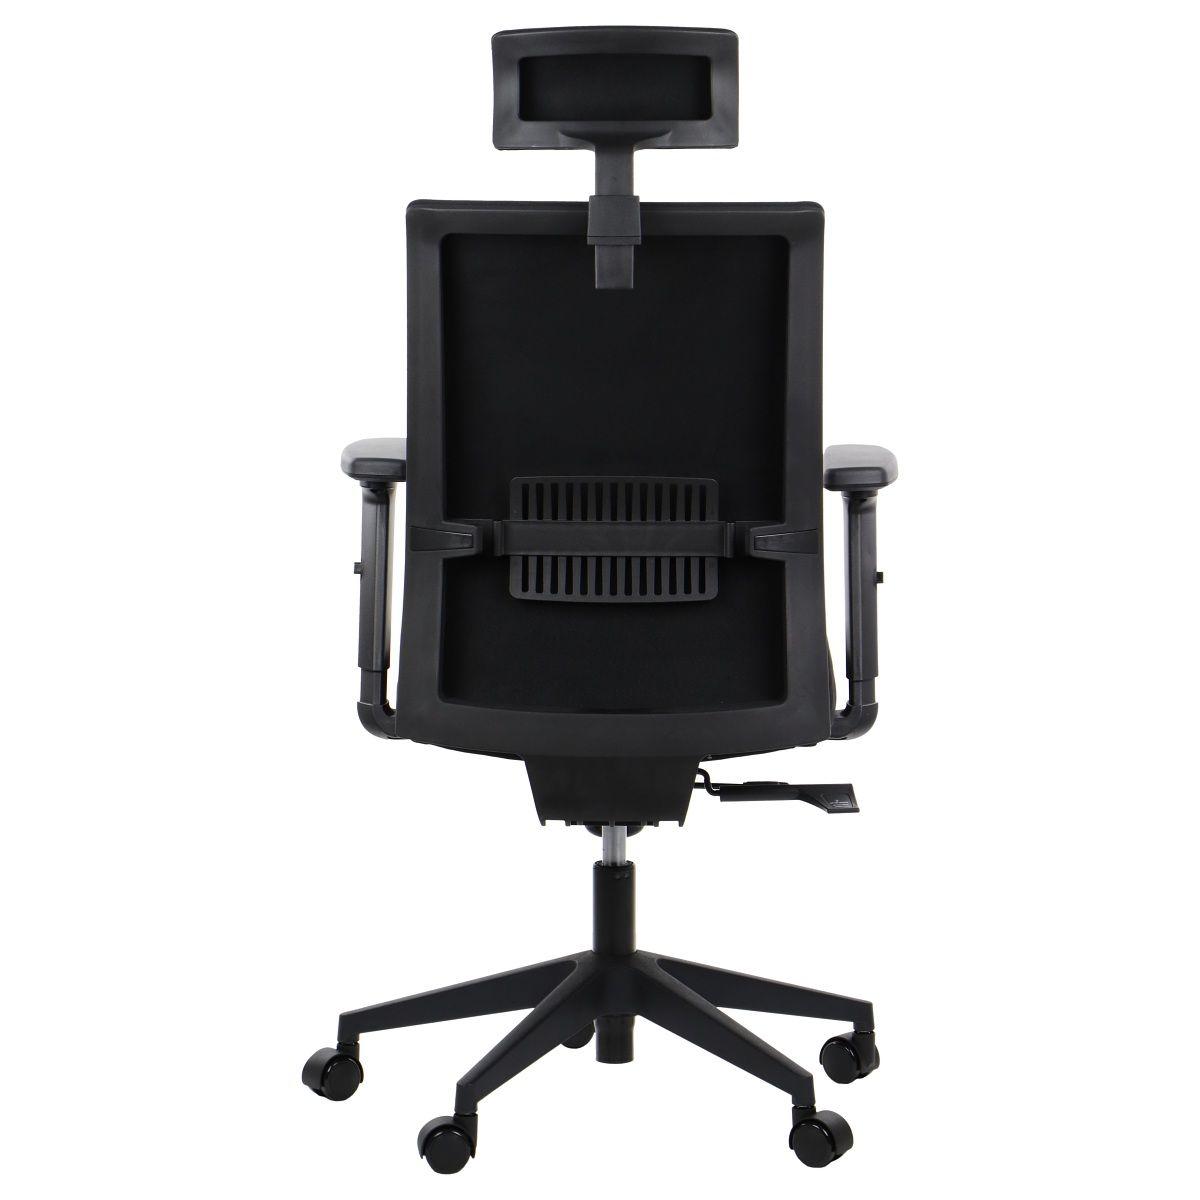 Fotel biurowy Riverton - tył oparcia